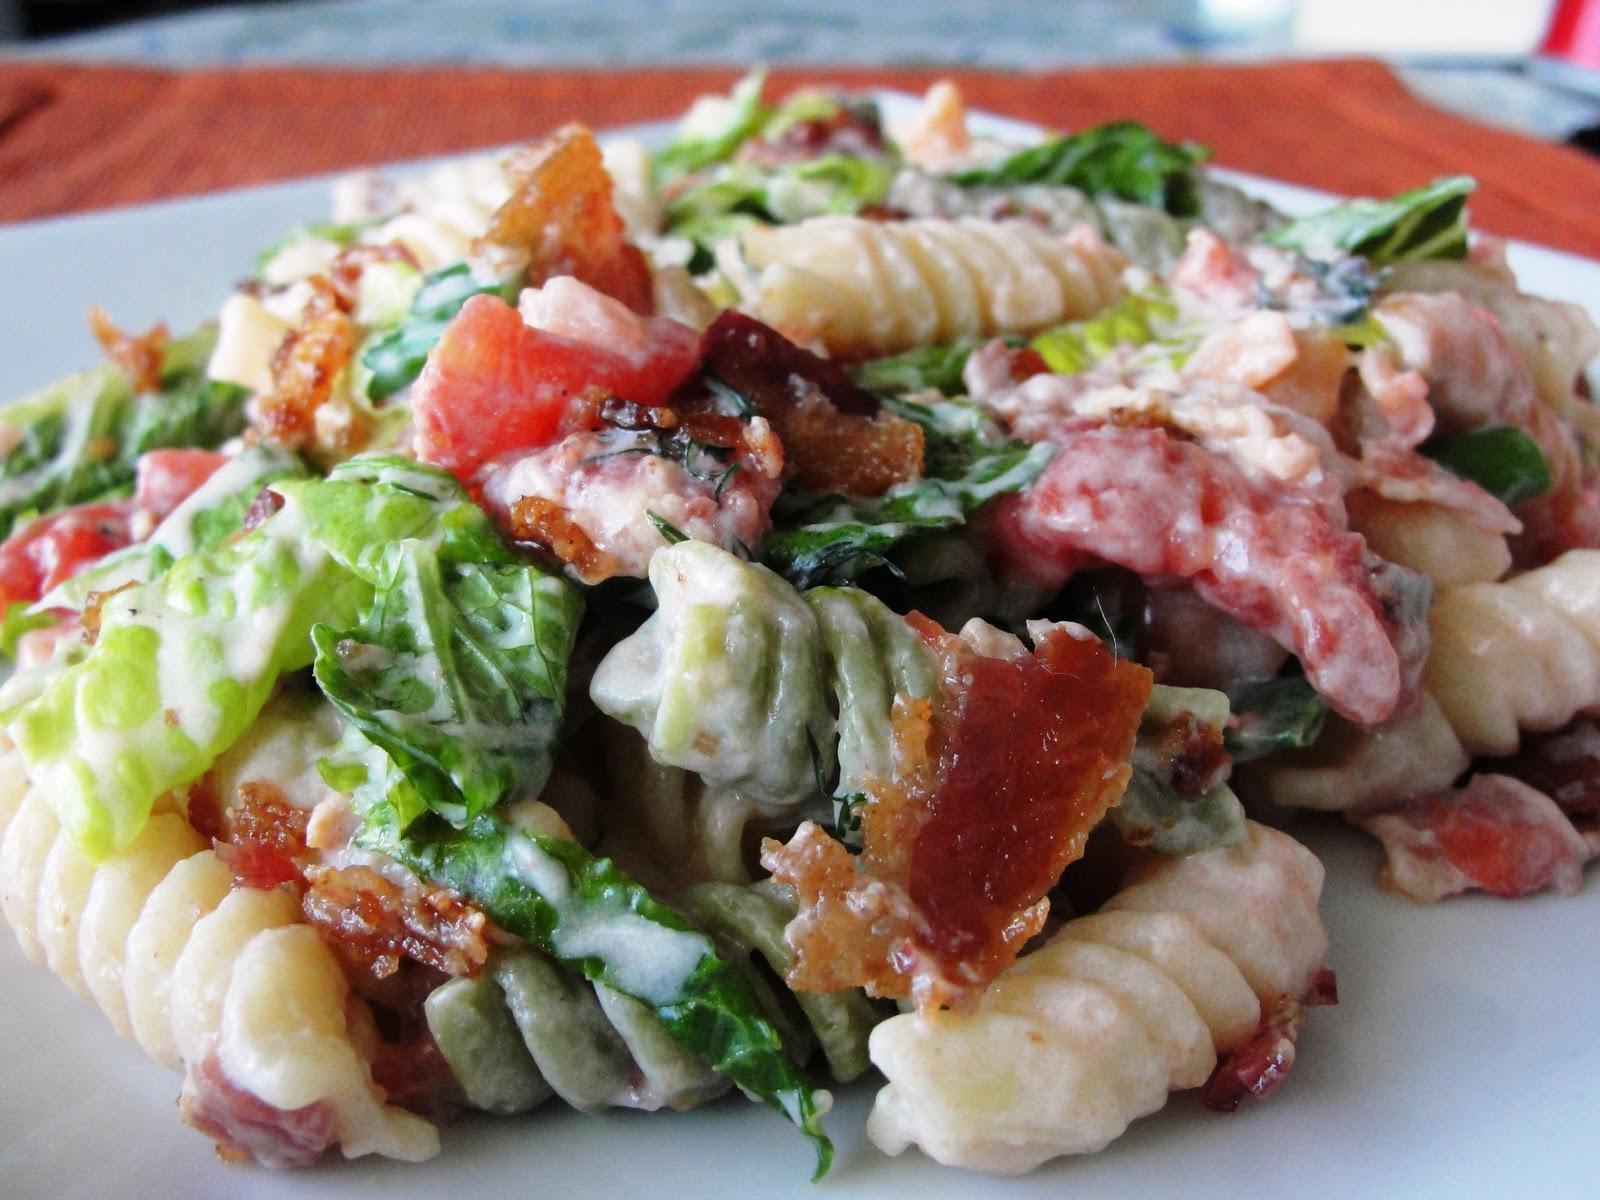 Mommy's Pots and Pans: BLT Pasta Salad